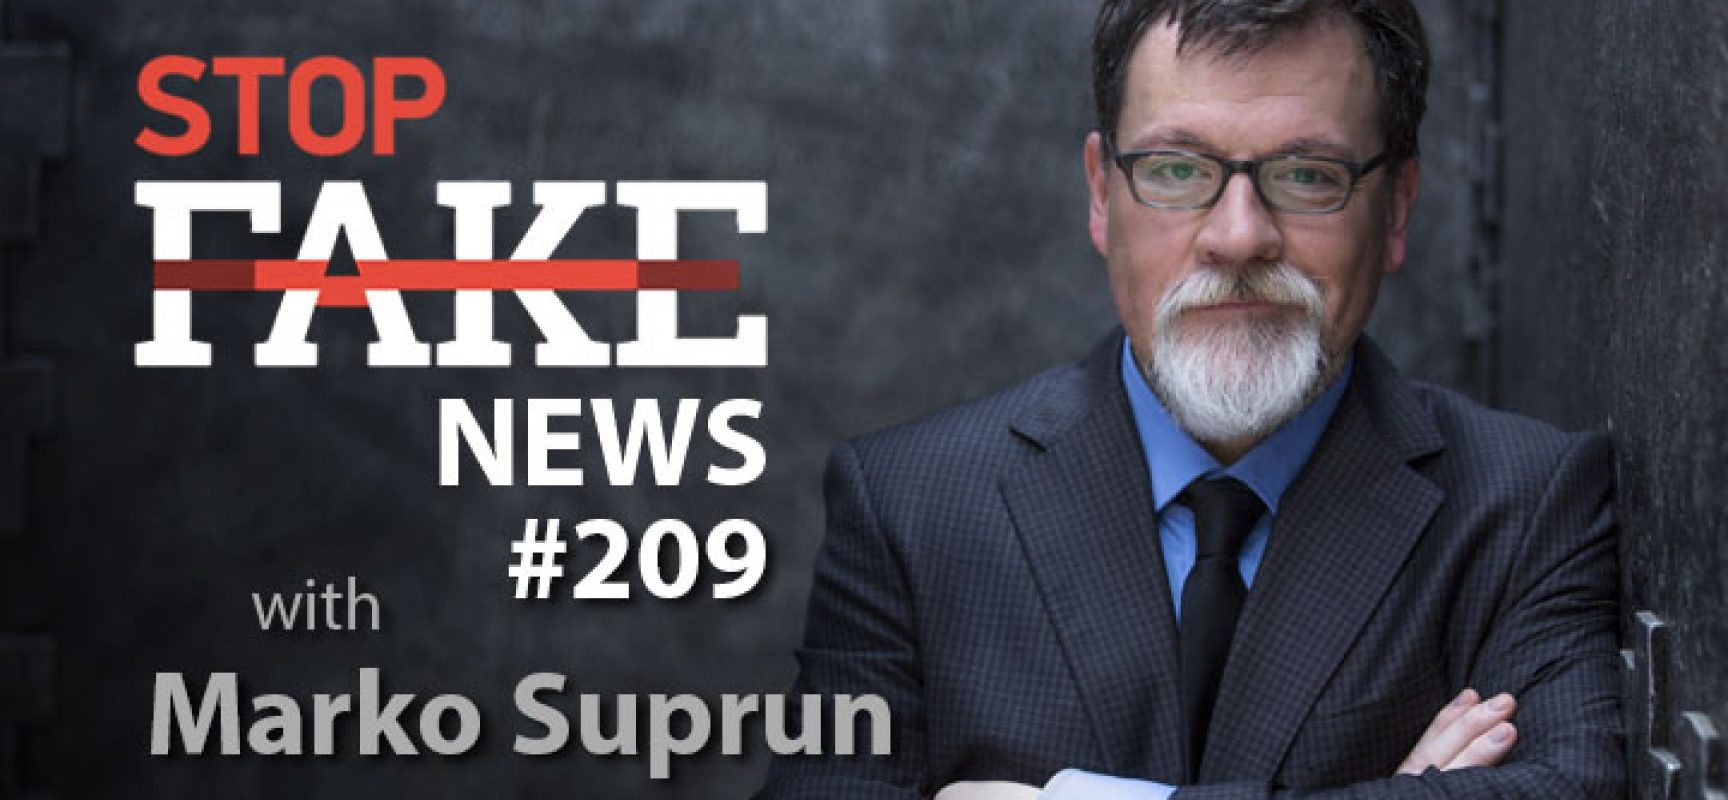 StopFake #209 con Marko Suprun